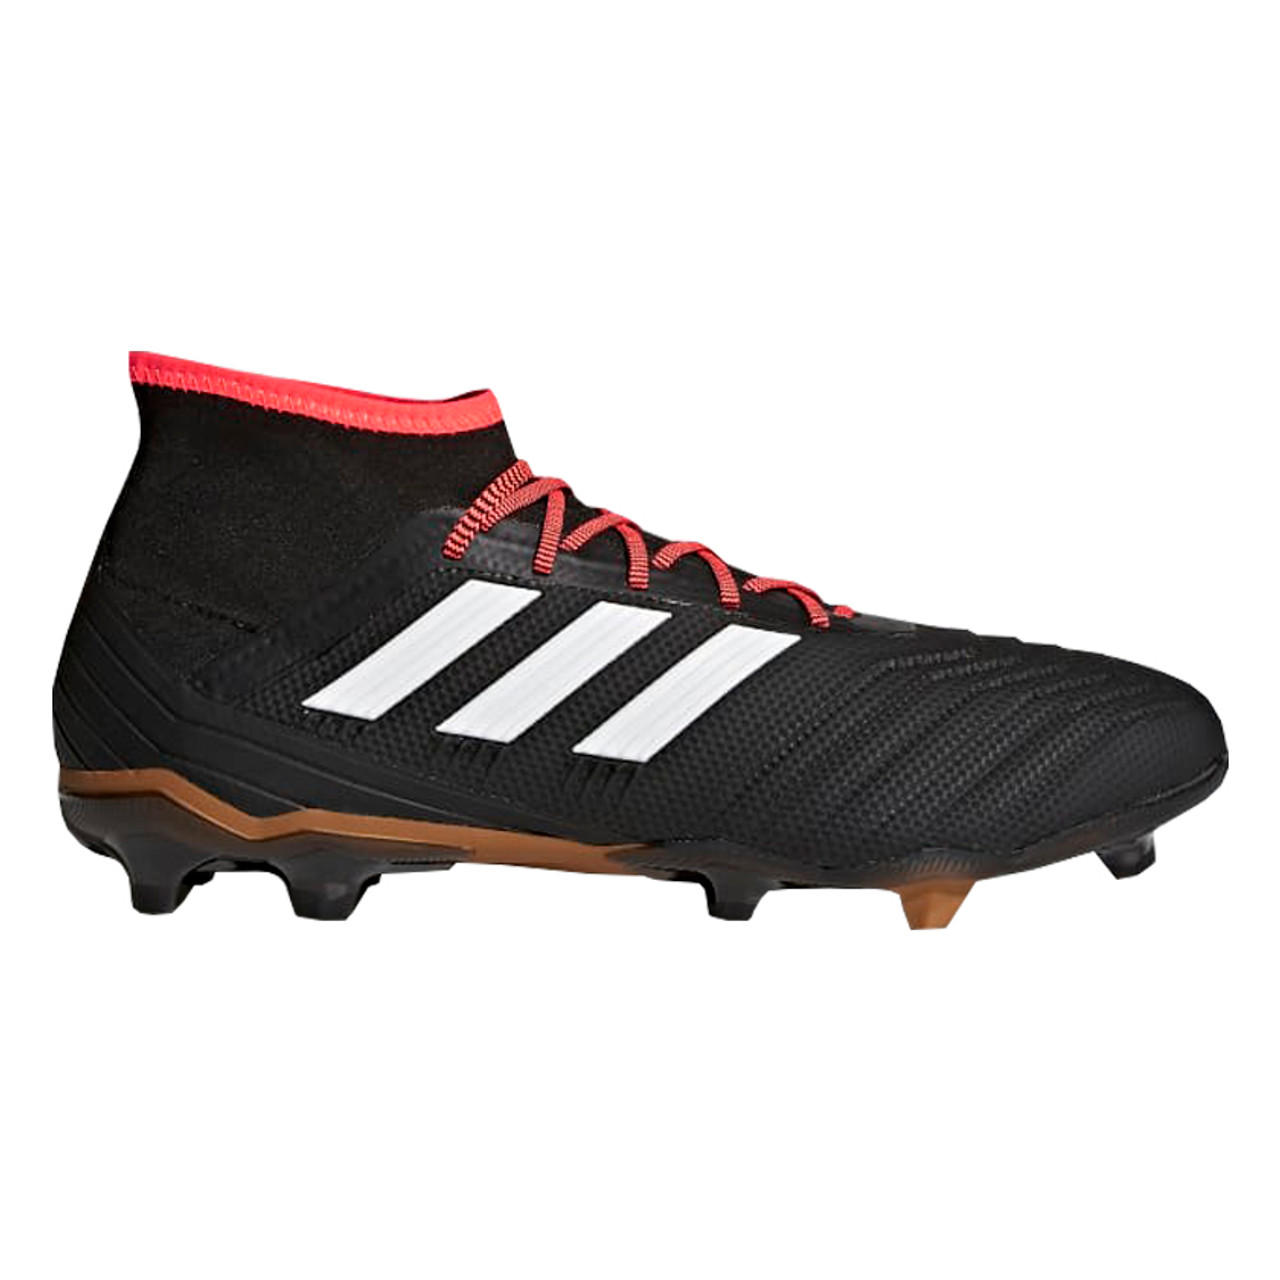 c4e6deb7b Adidas Predator 18.2 FG Men s Soccer Cleats CP9290 - Black